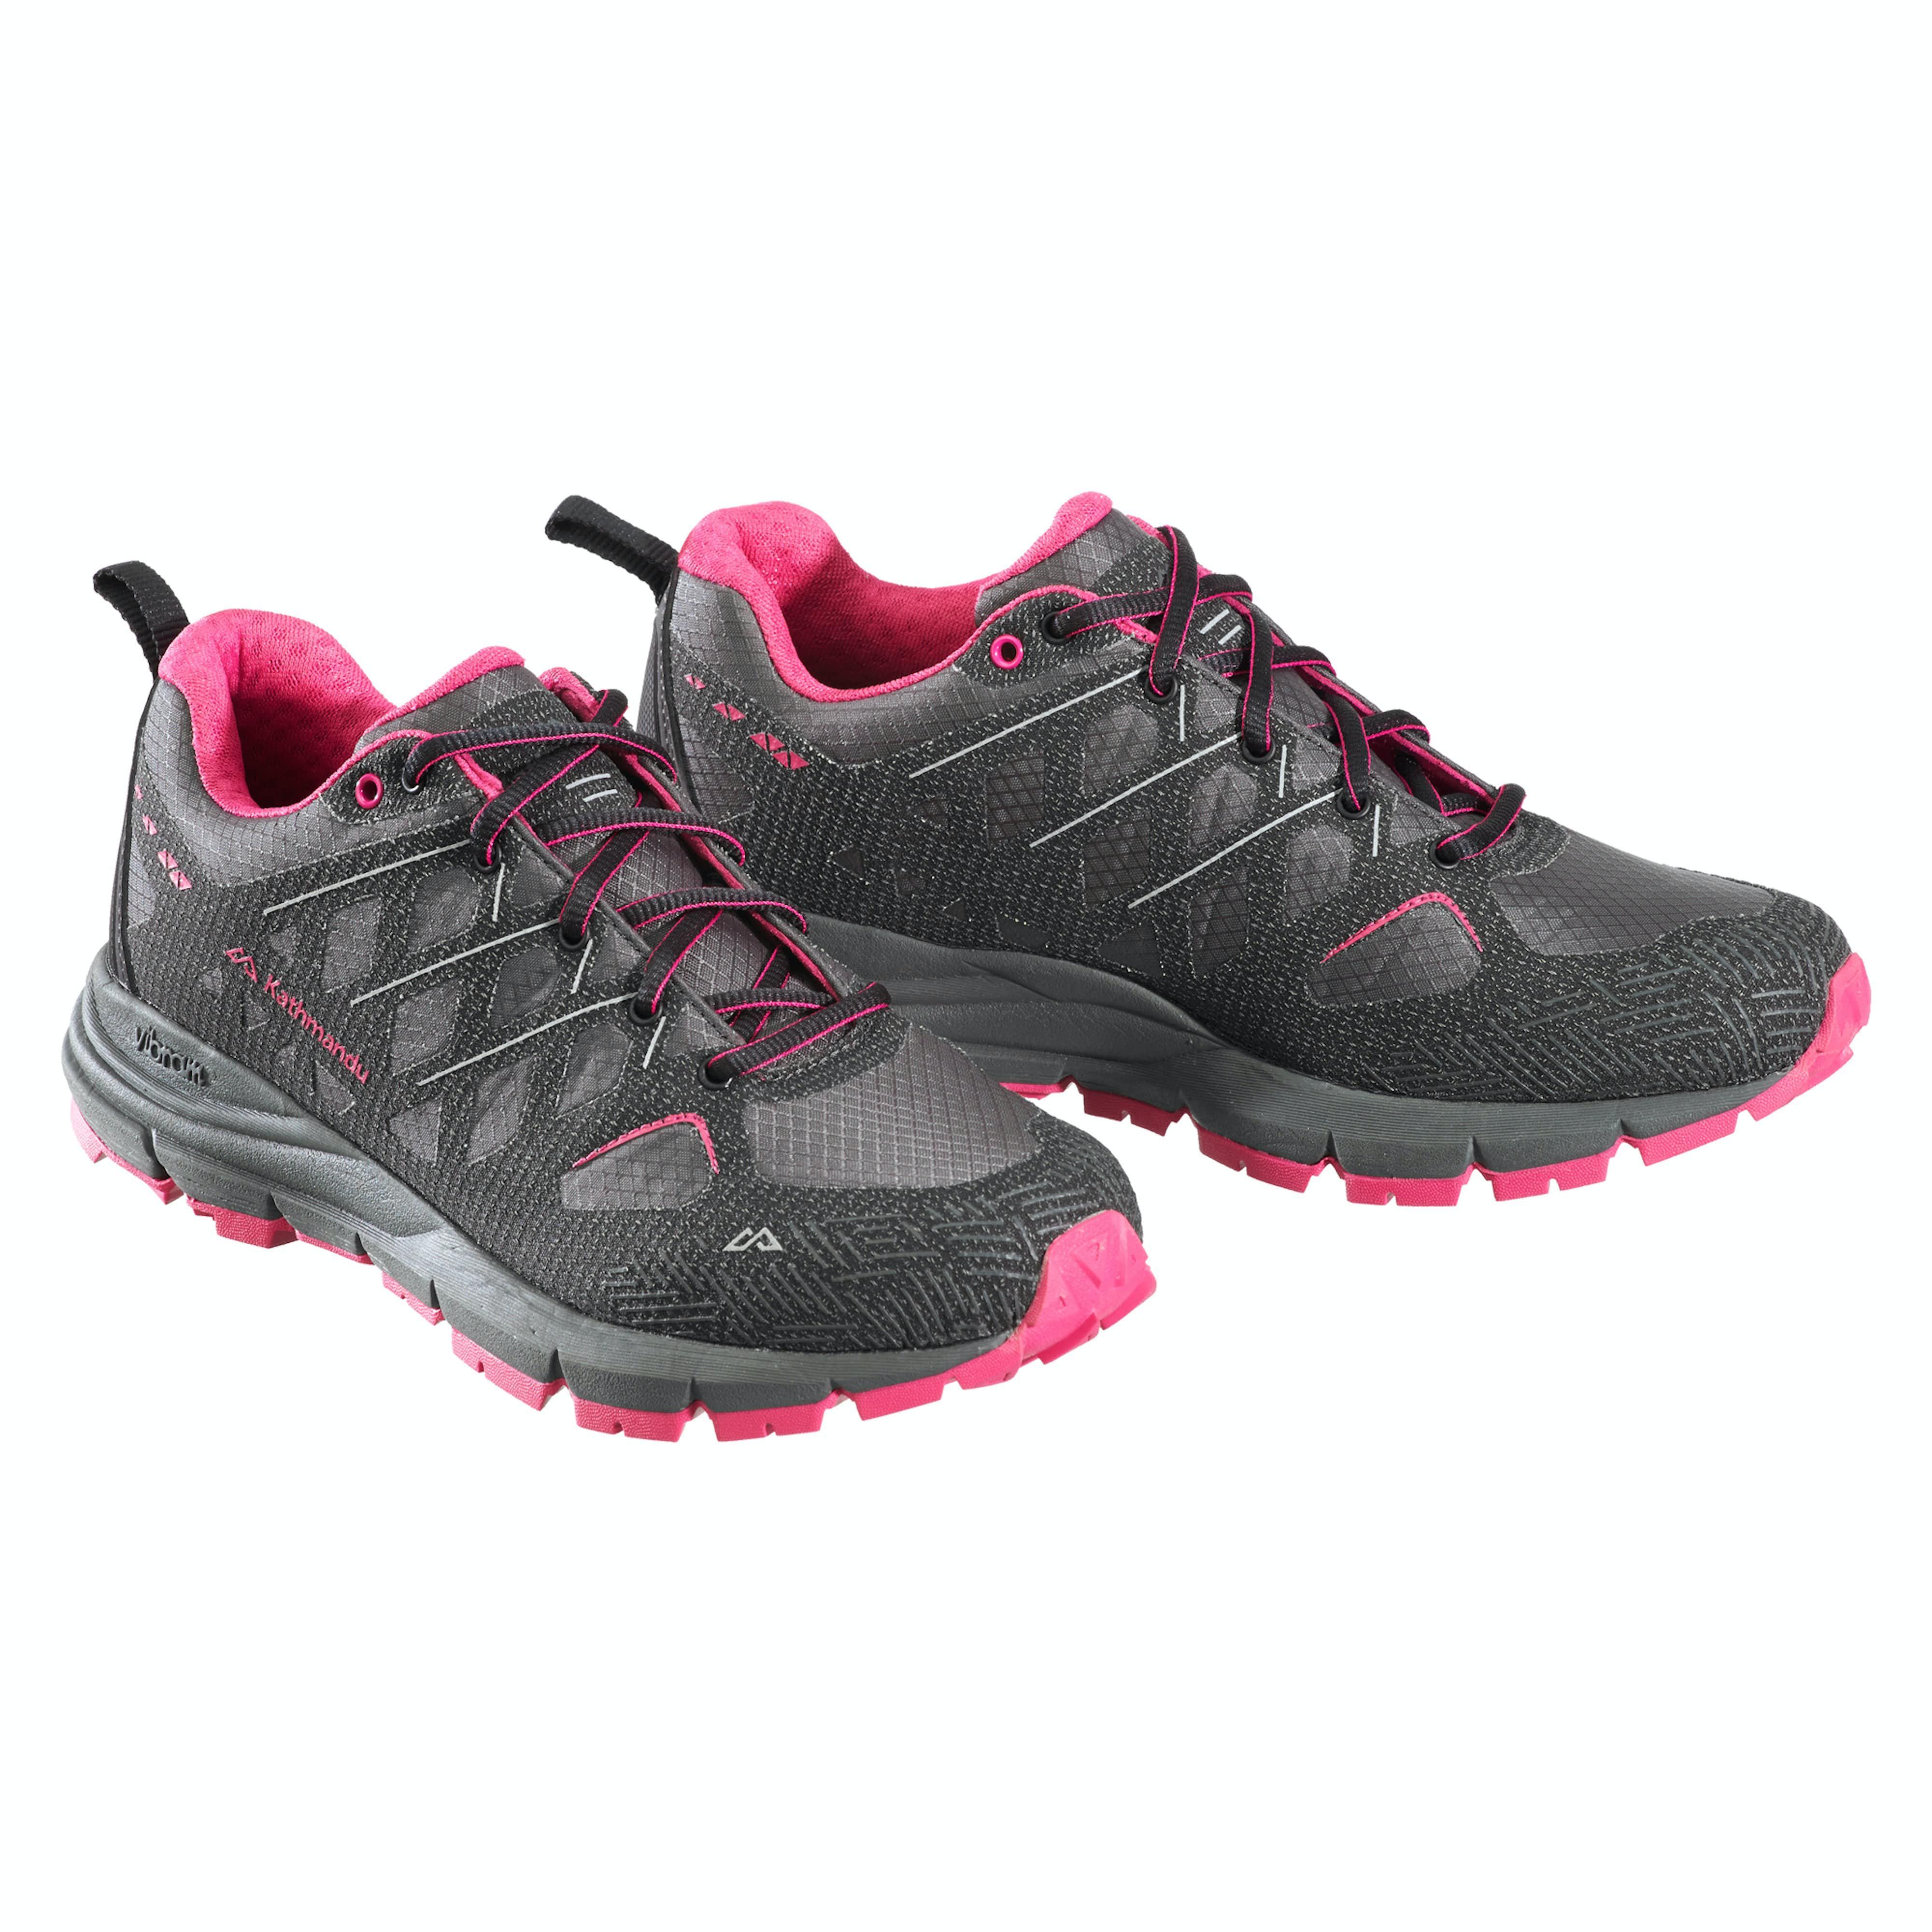 d05b80355b3 Zeolite Women s Trail Shoes - Grey Raspberry